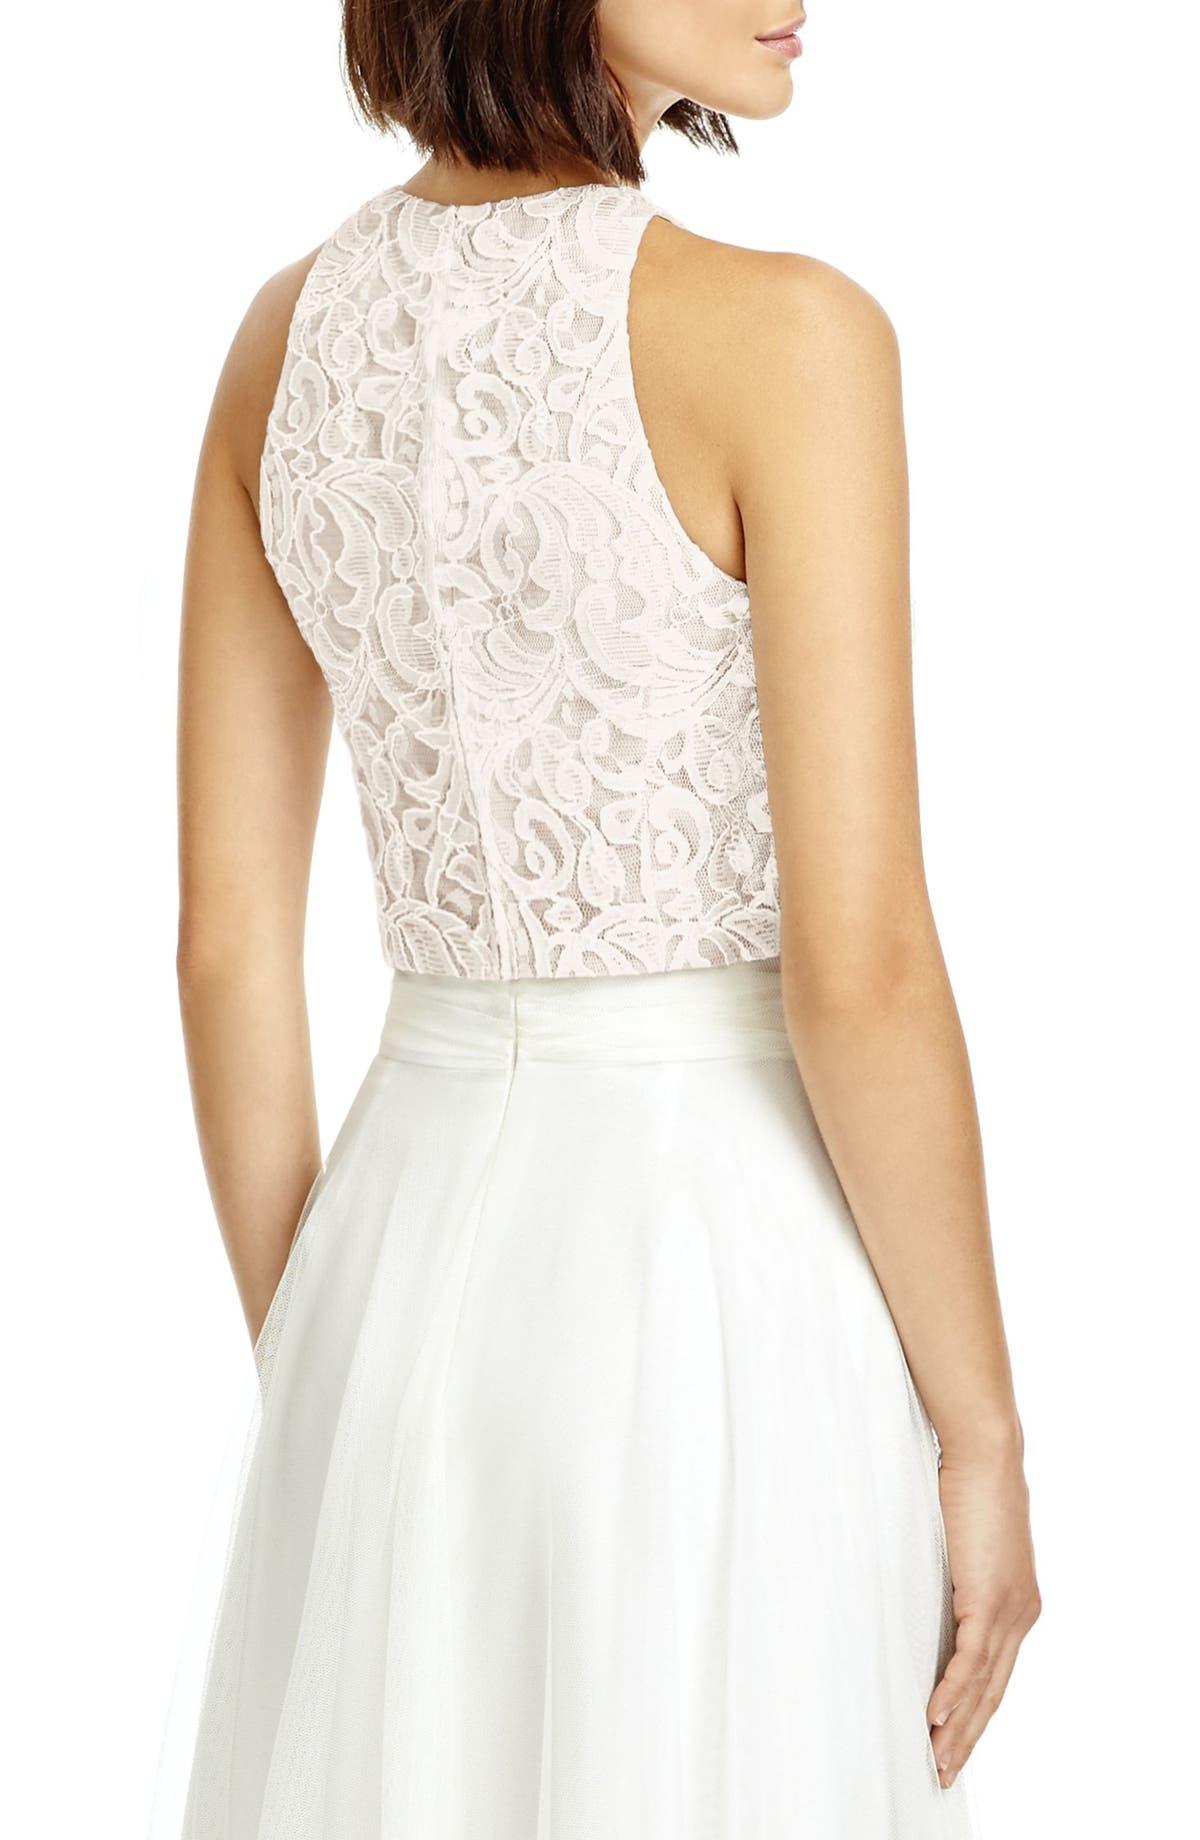 84e42f8b6e942 Dessy Collection Lace Halter Style Crop Top